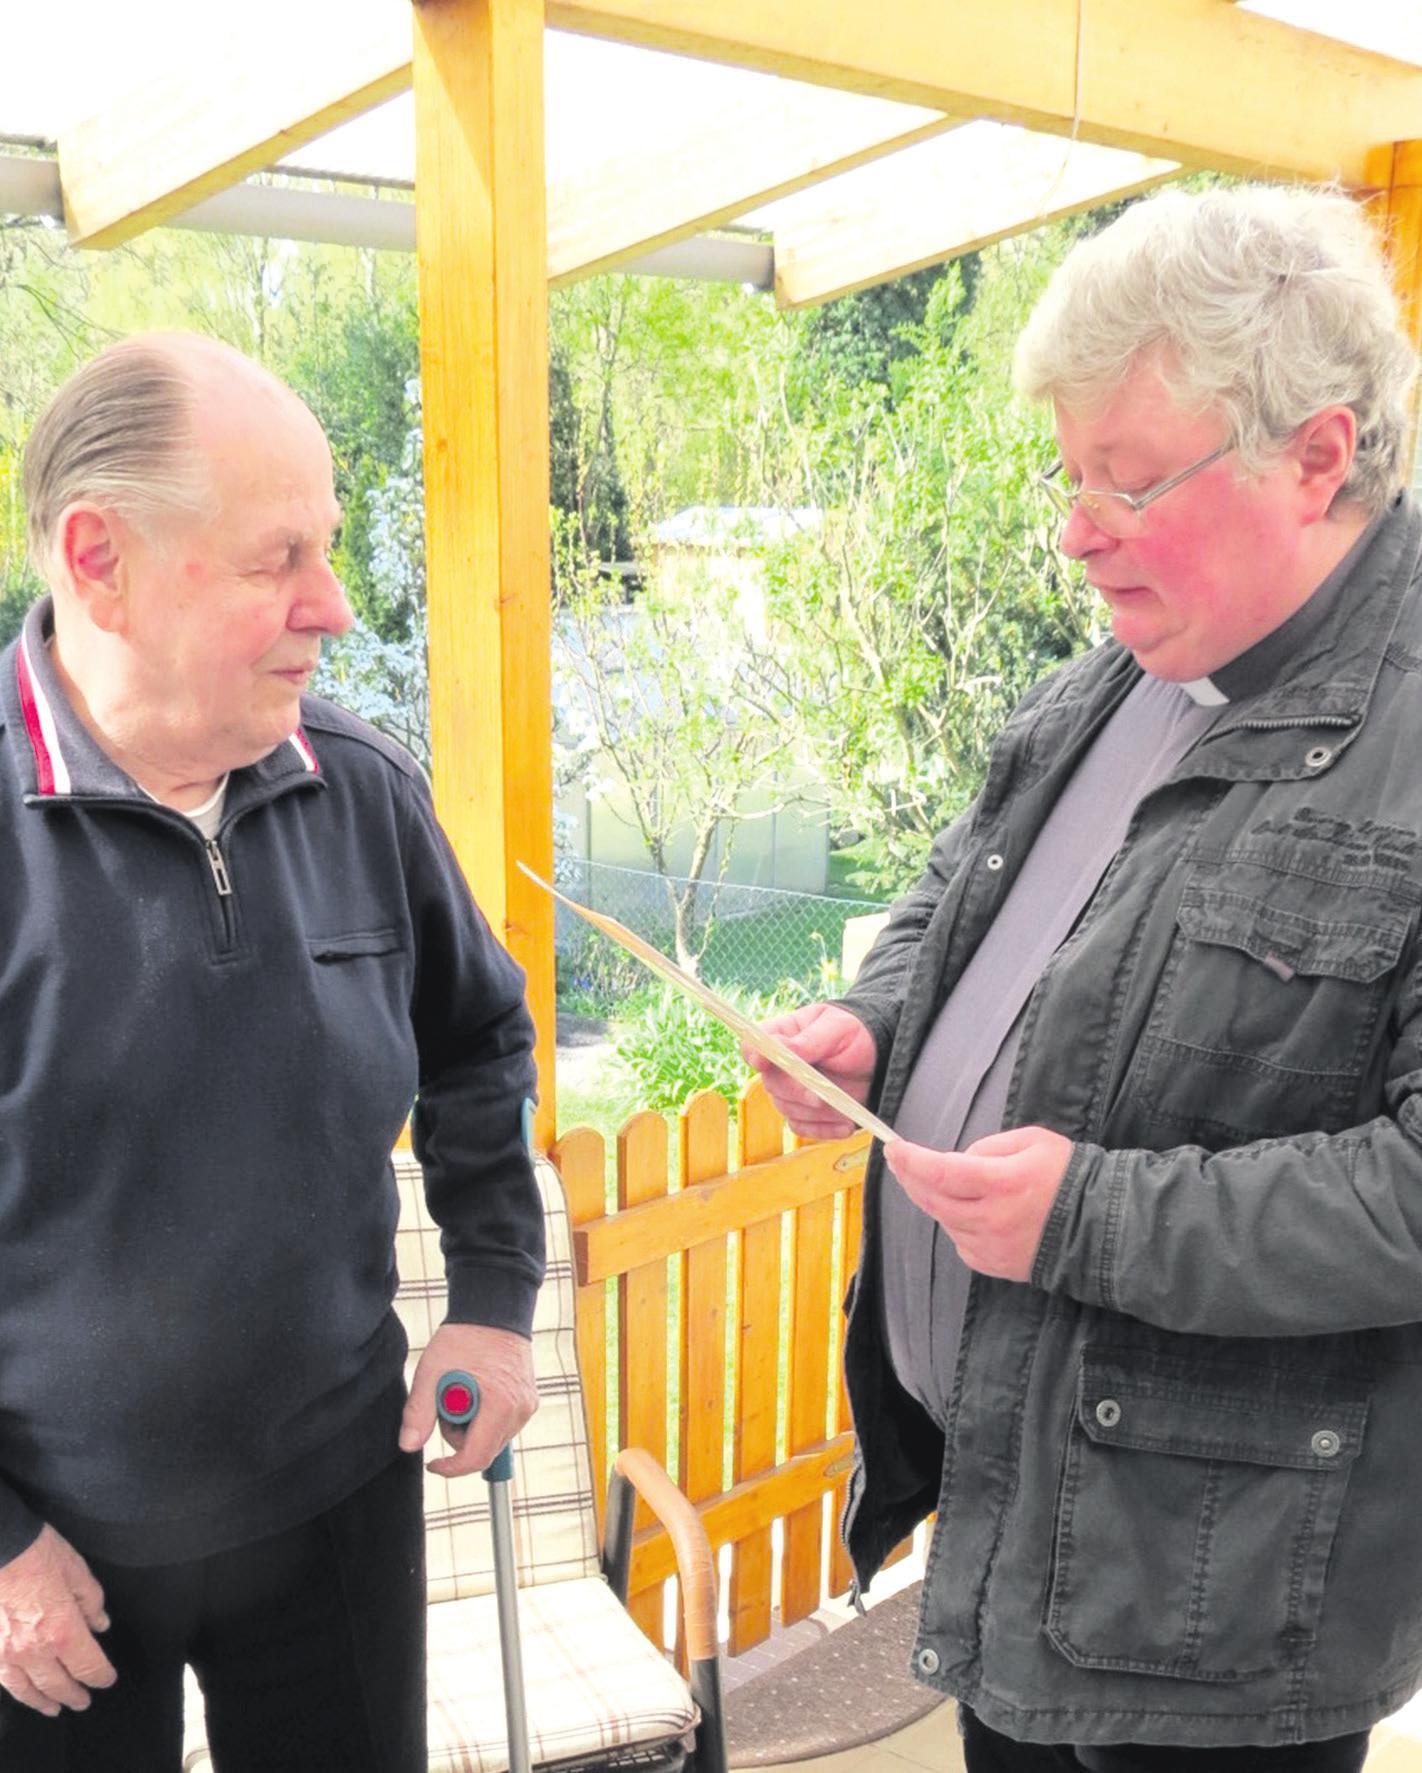 Präses Pater Andrzej Tenerowicz mit dem Jubilar Werner Debertin (links). Foto: Bernhard Kolle